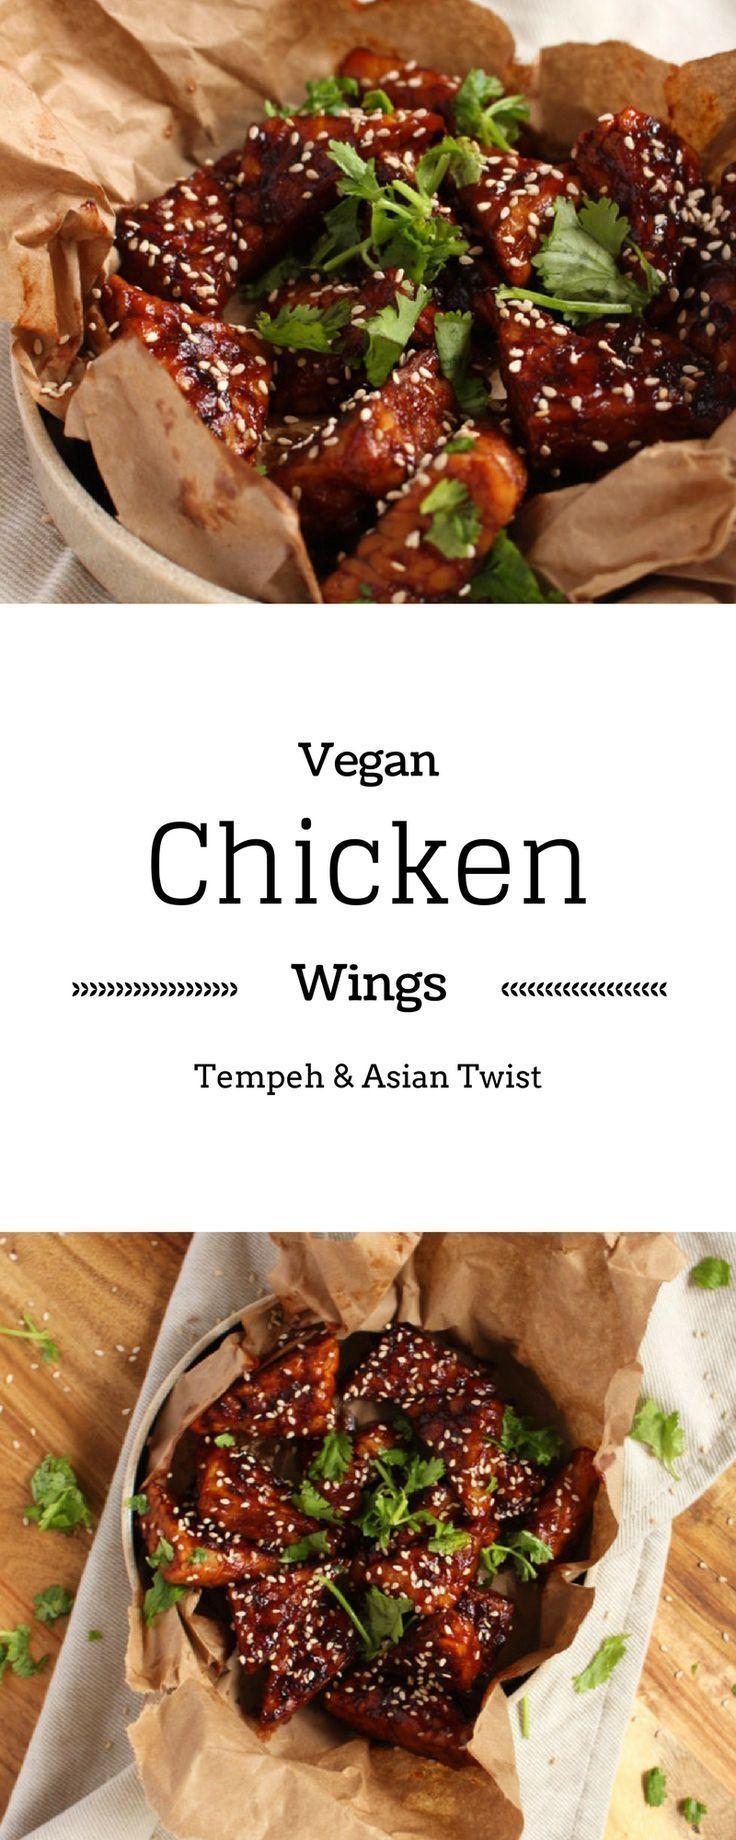 Vegan Chicken Wings - Tempeh